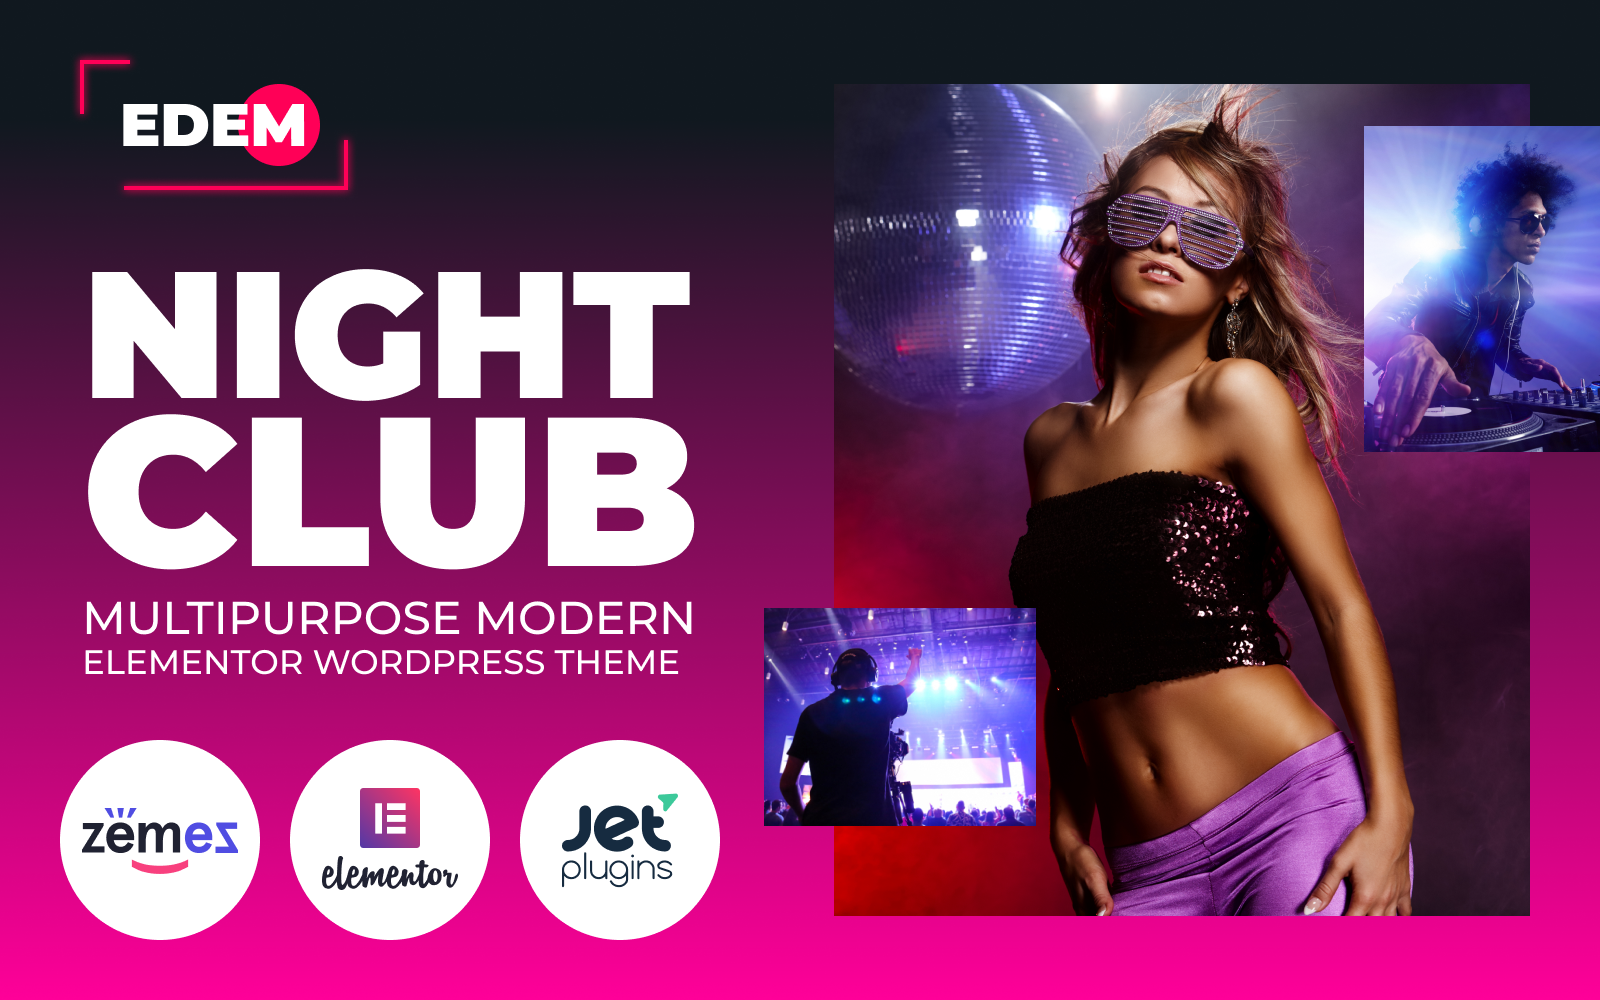 Reszponzív Edem - Night Club Multipurpose Modern Elementor WordPress sablon 84736